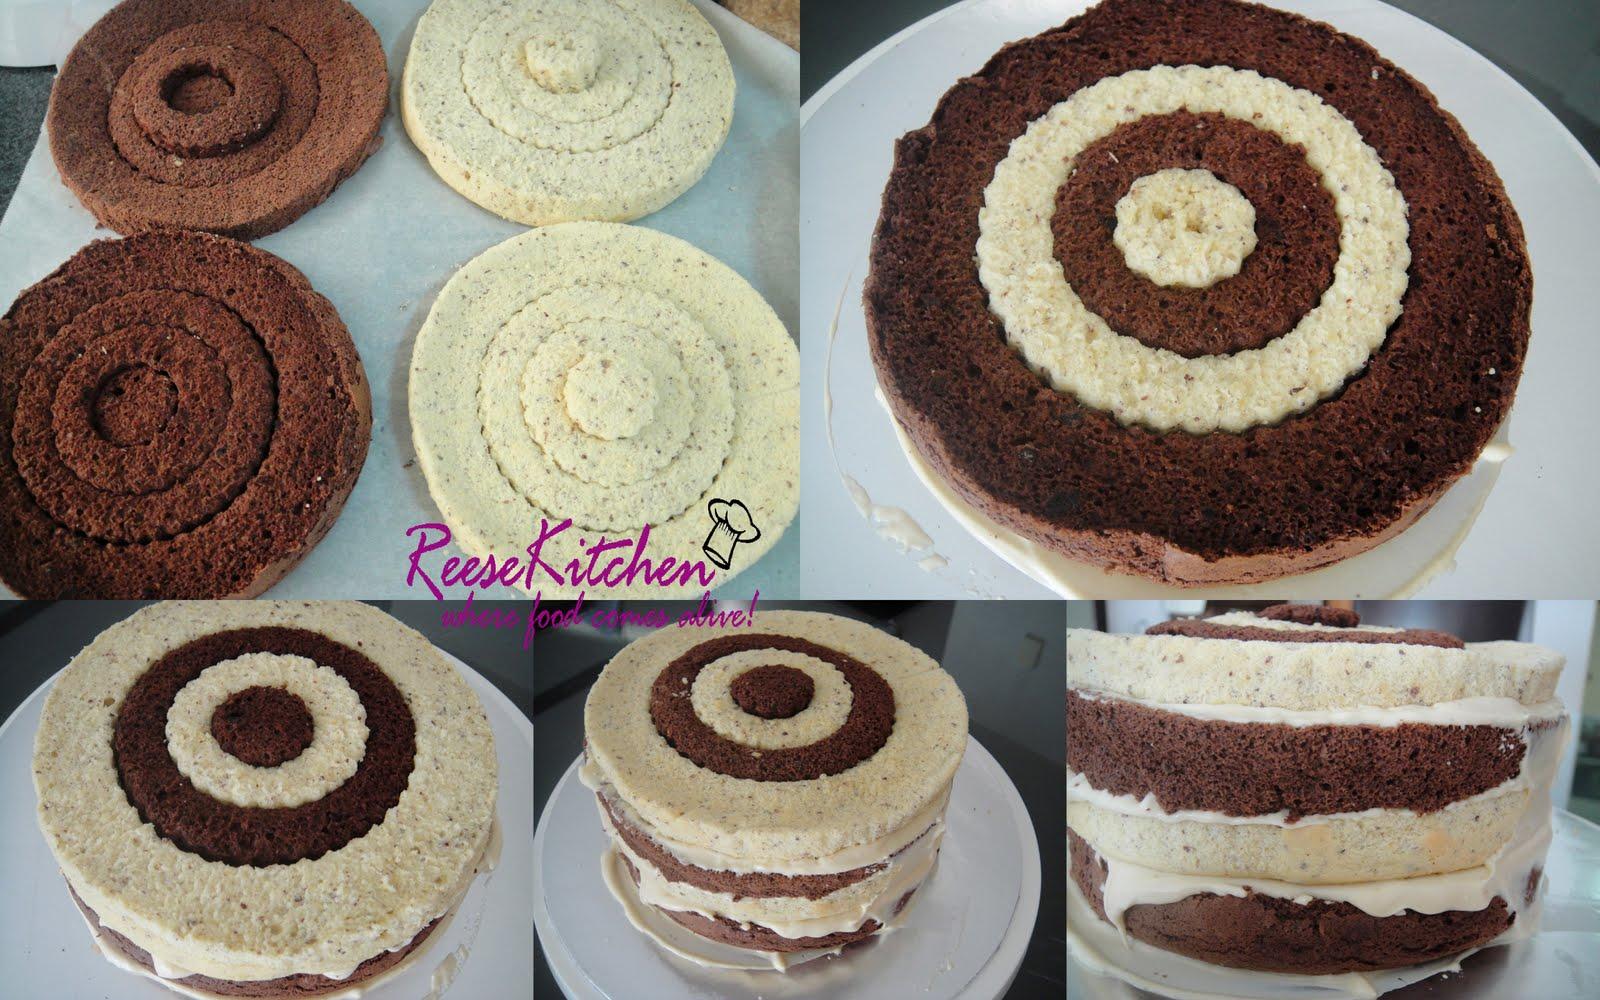 ReeseKitchen Special Tiramisu Cake